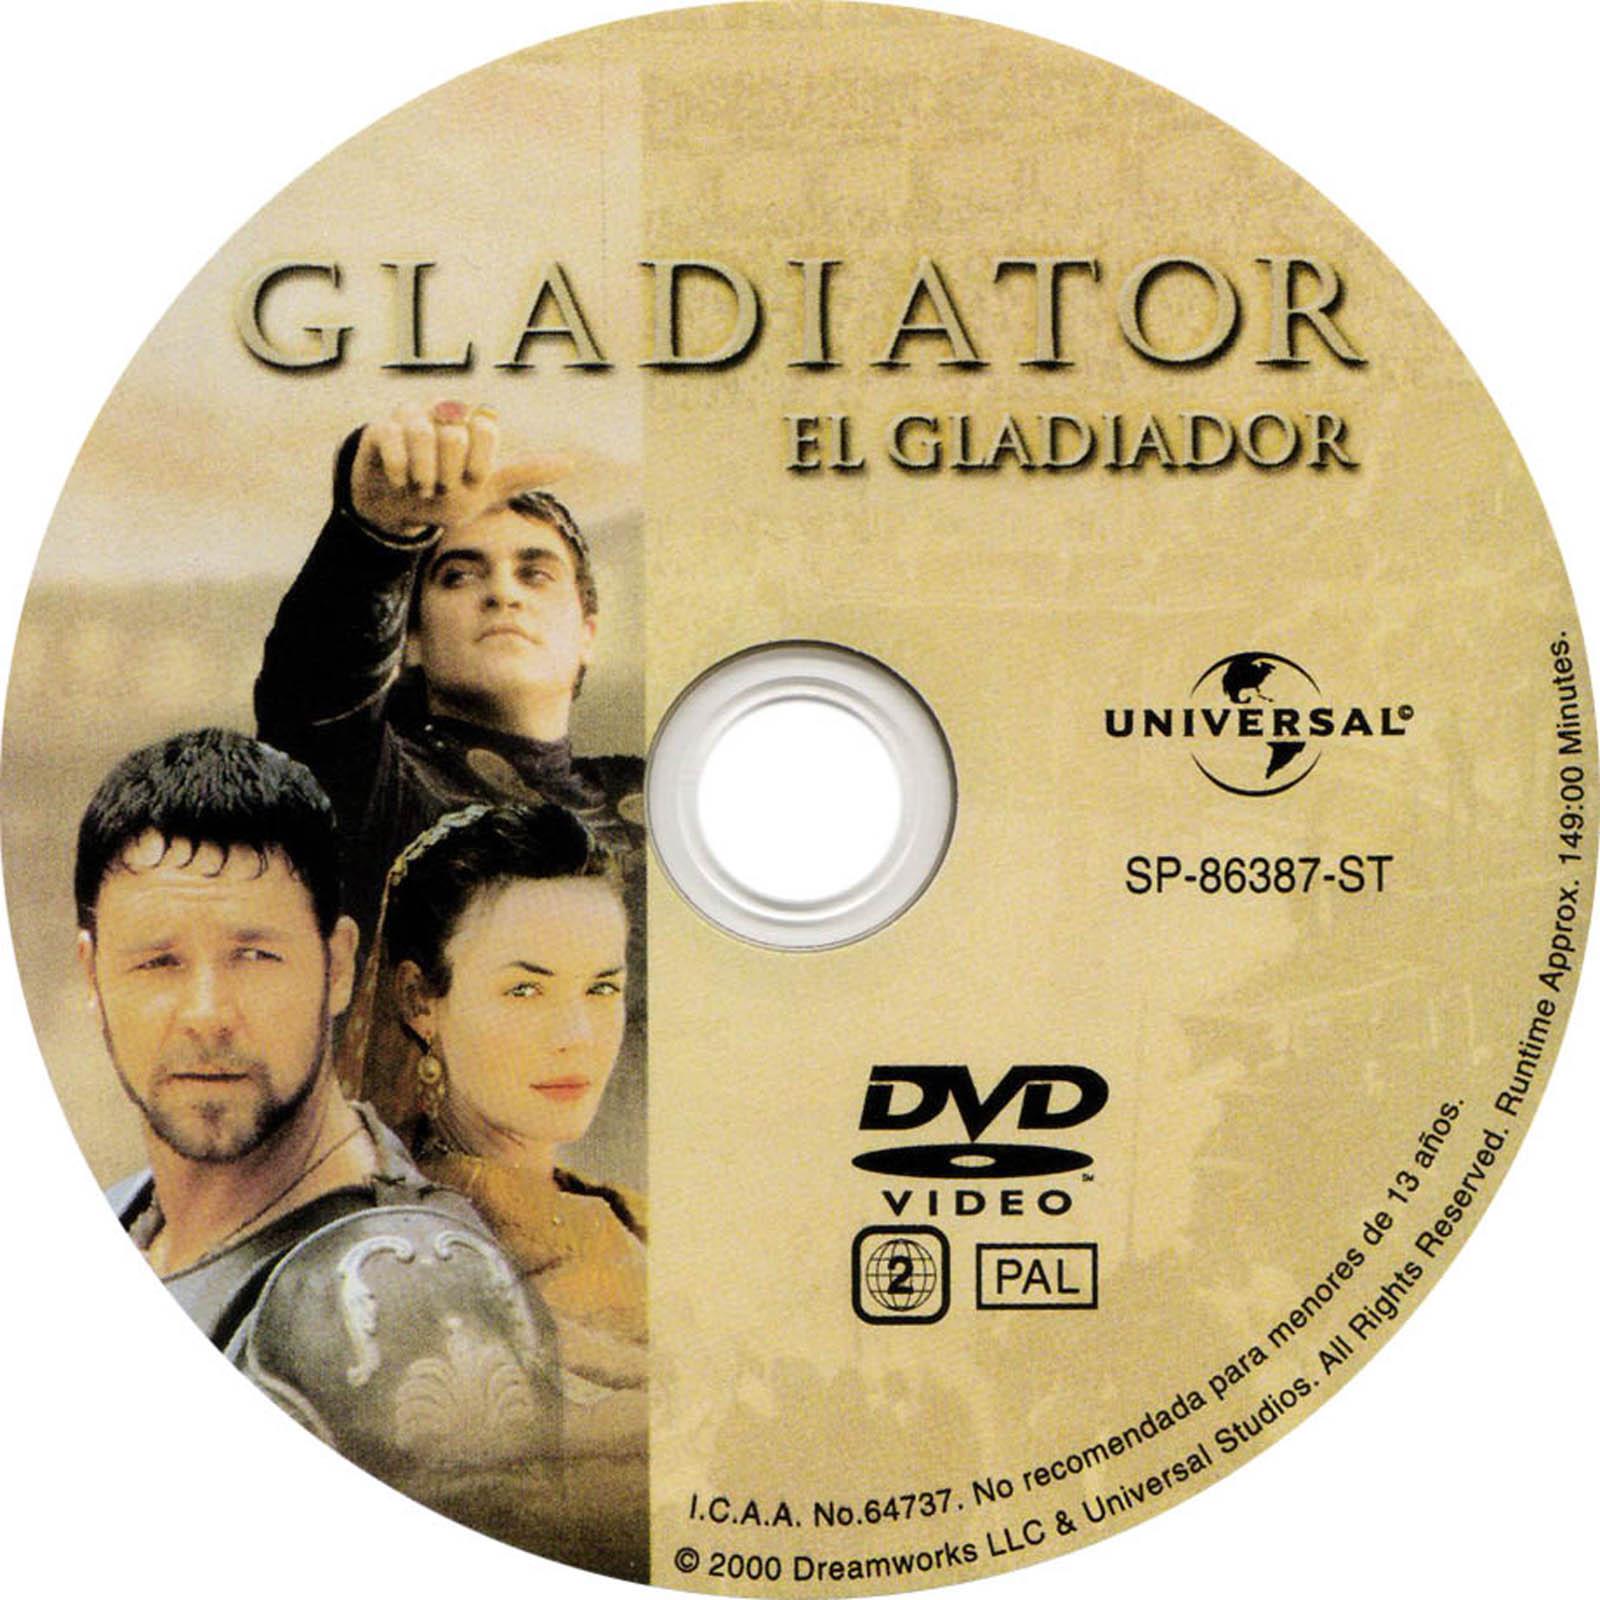 Gladiator Dvd Label Art